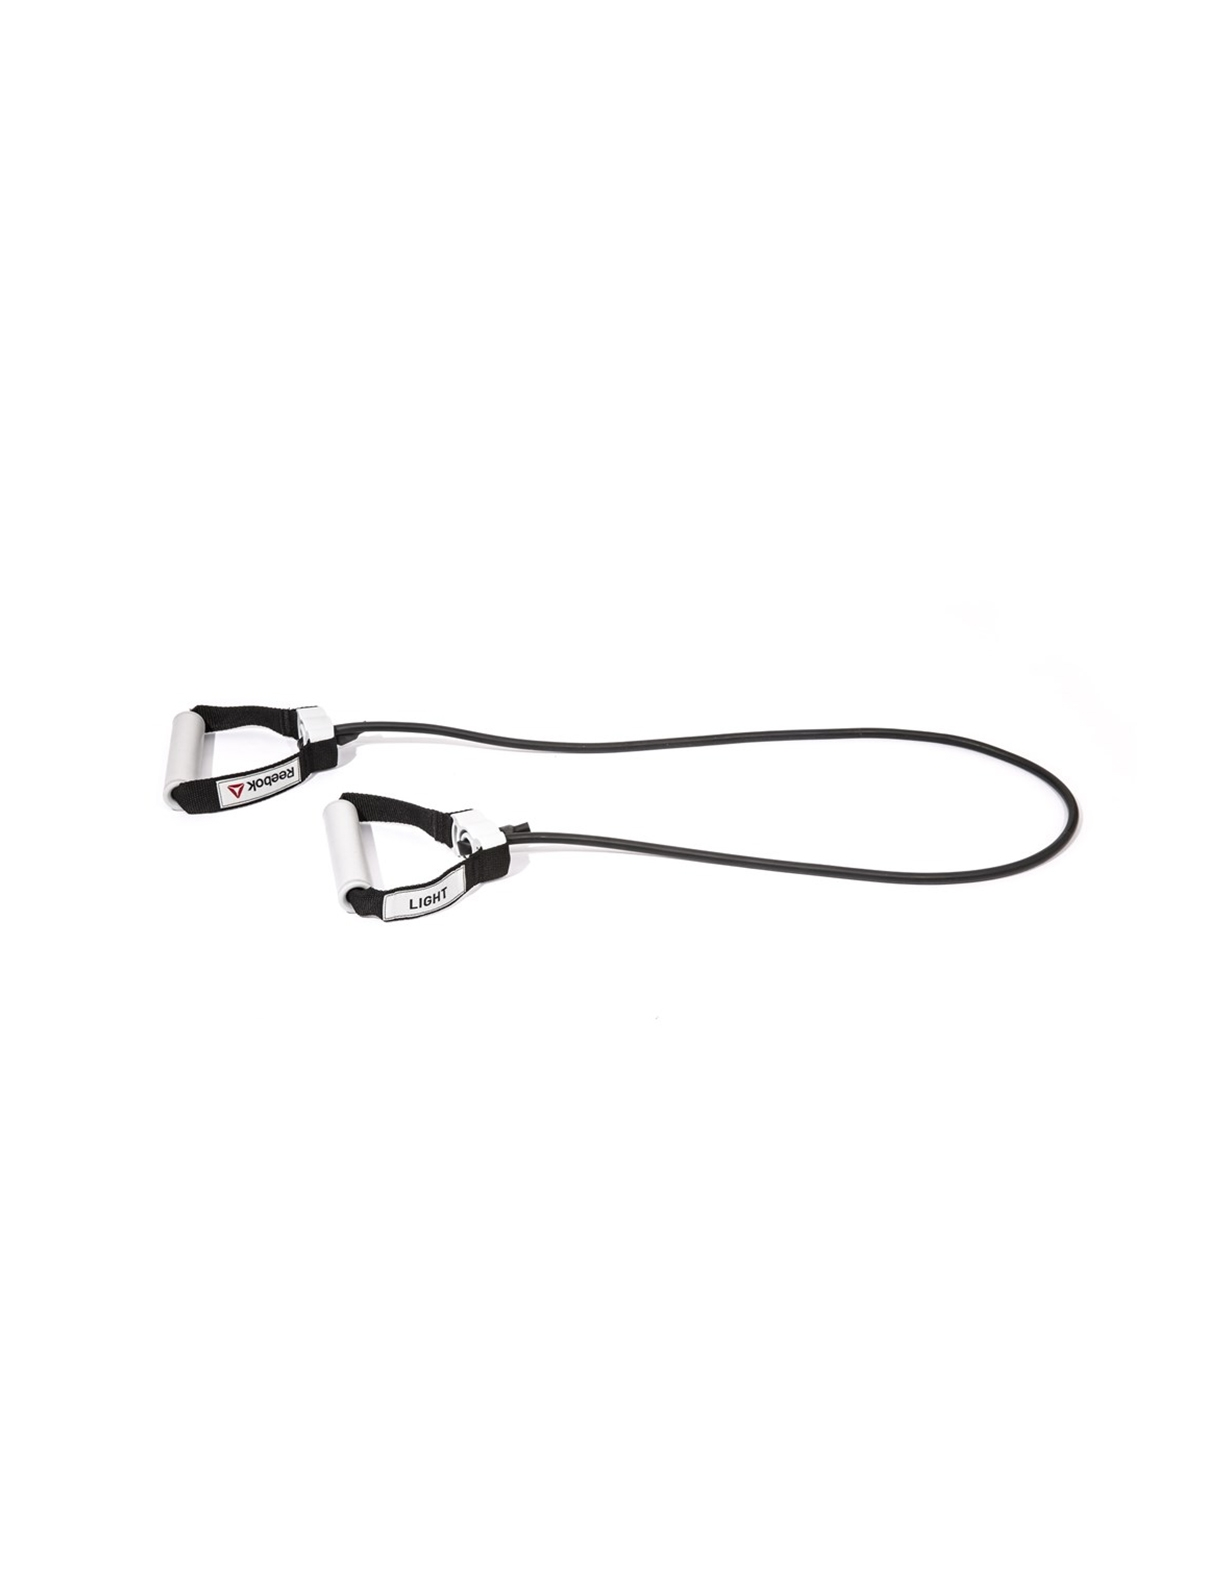 RSTB-16075  Adjustable Resistance Tube heavy